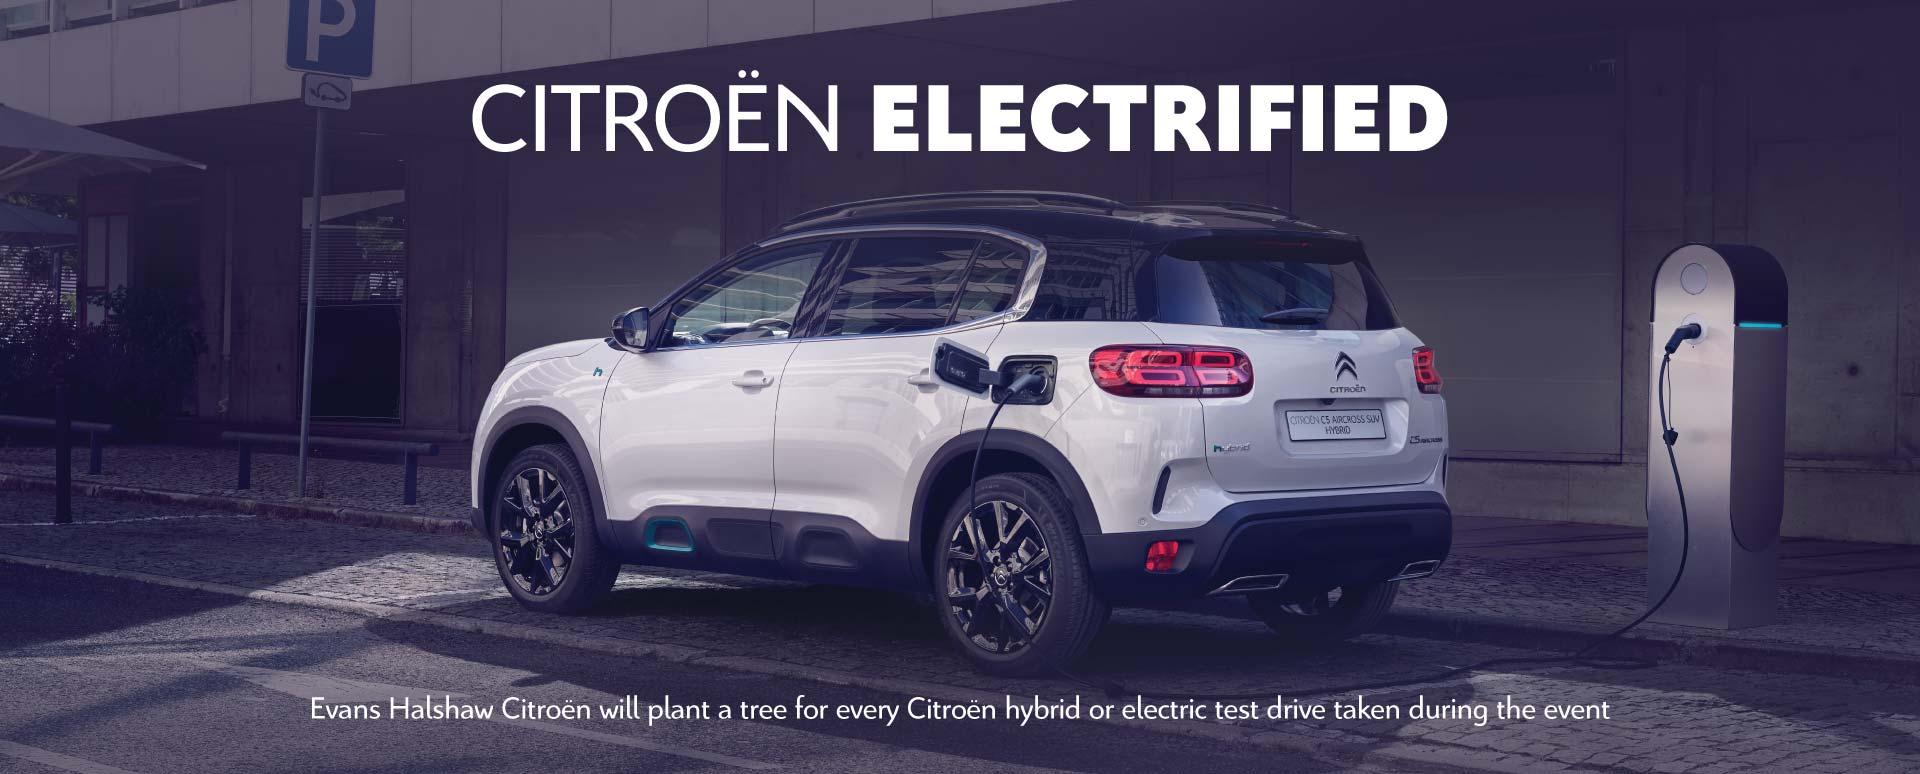 Citroen Electrified